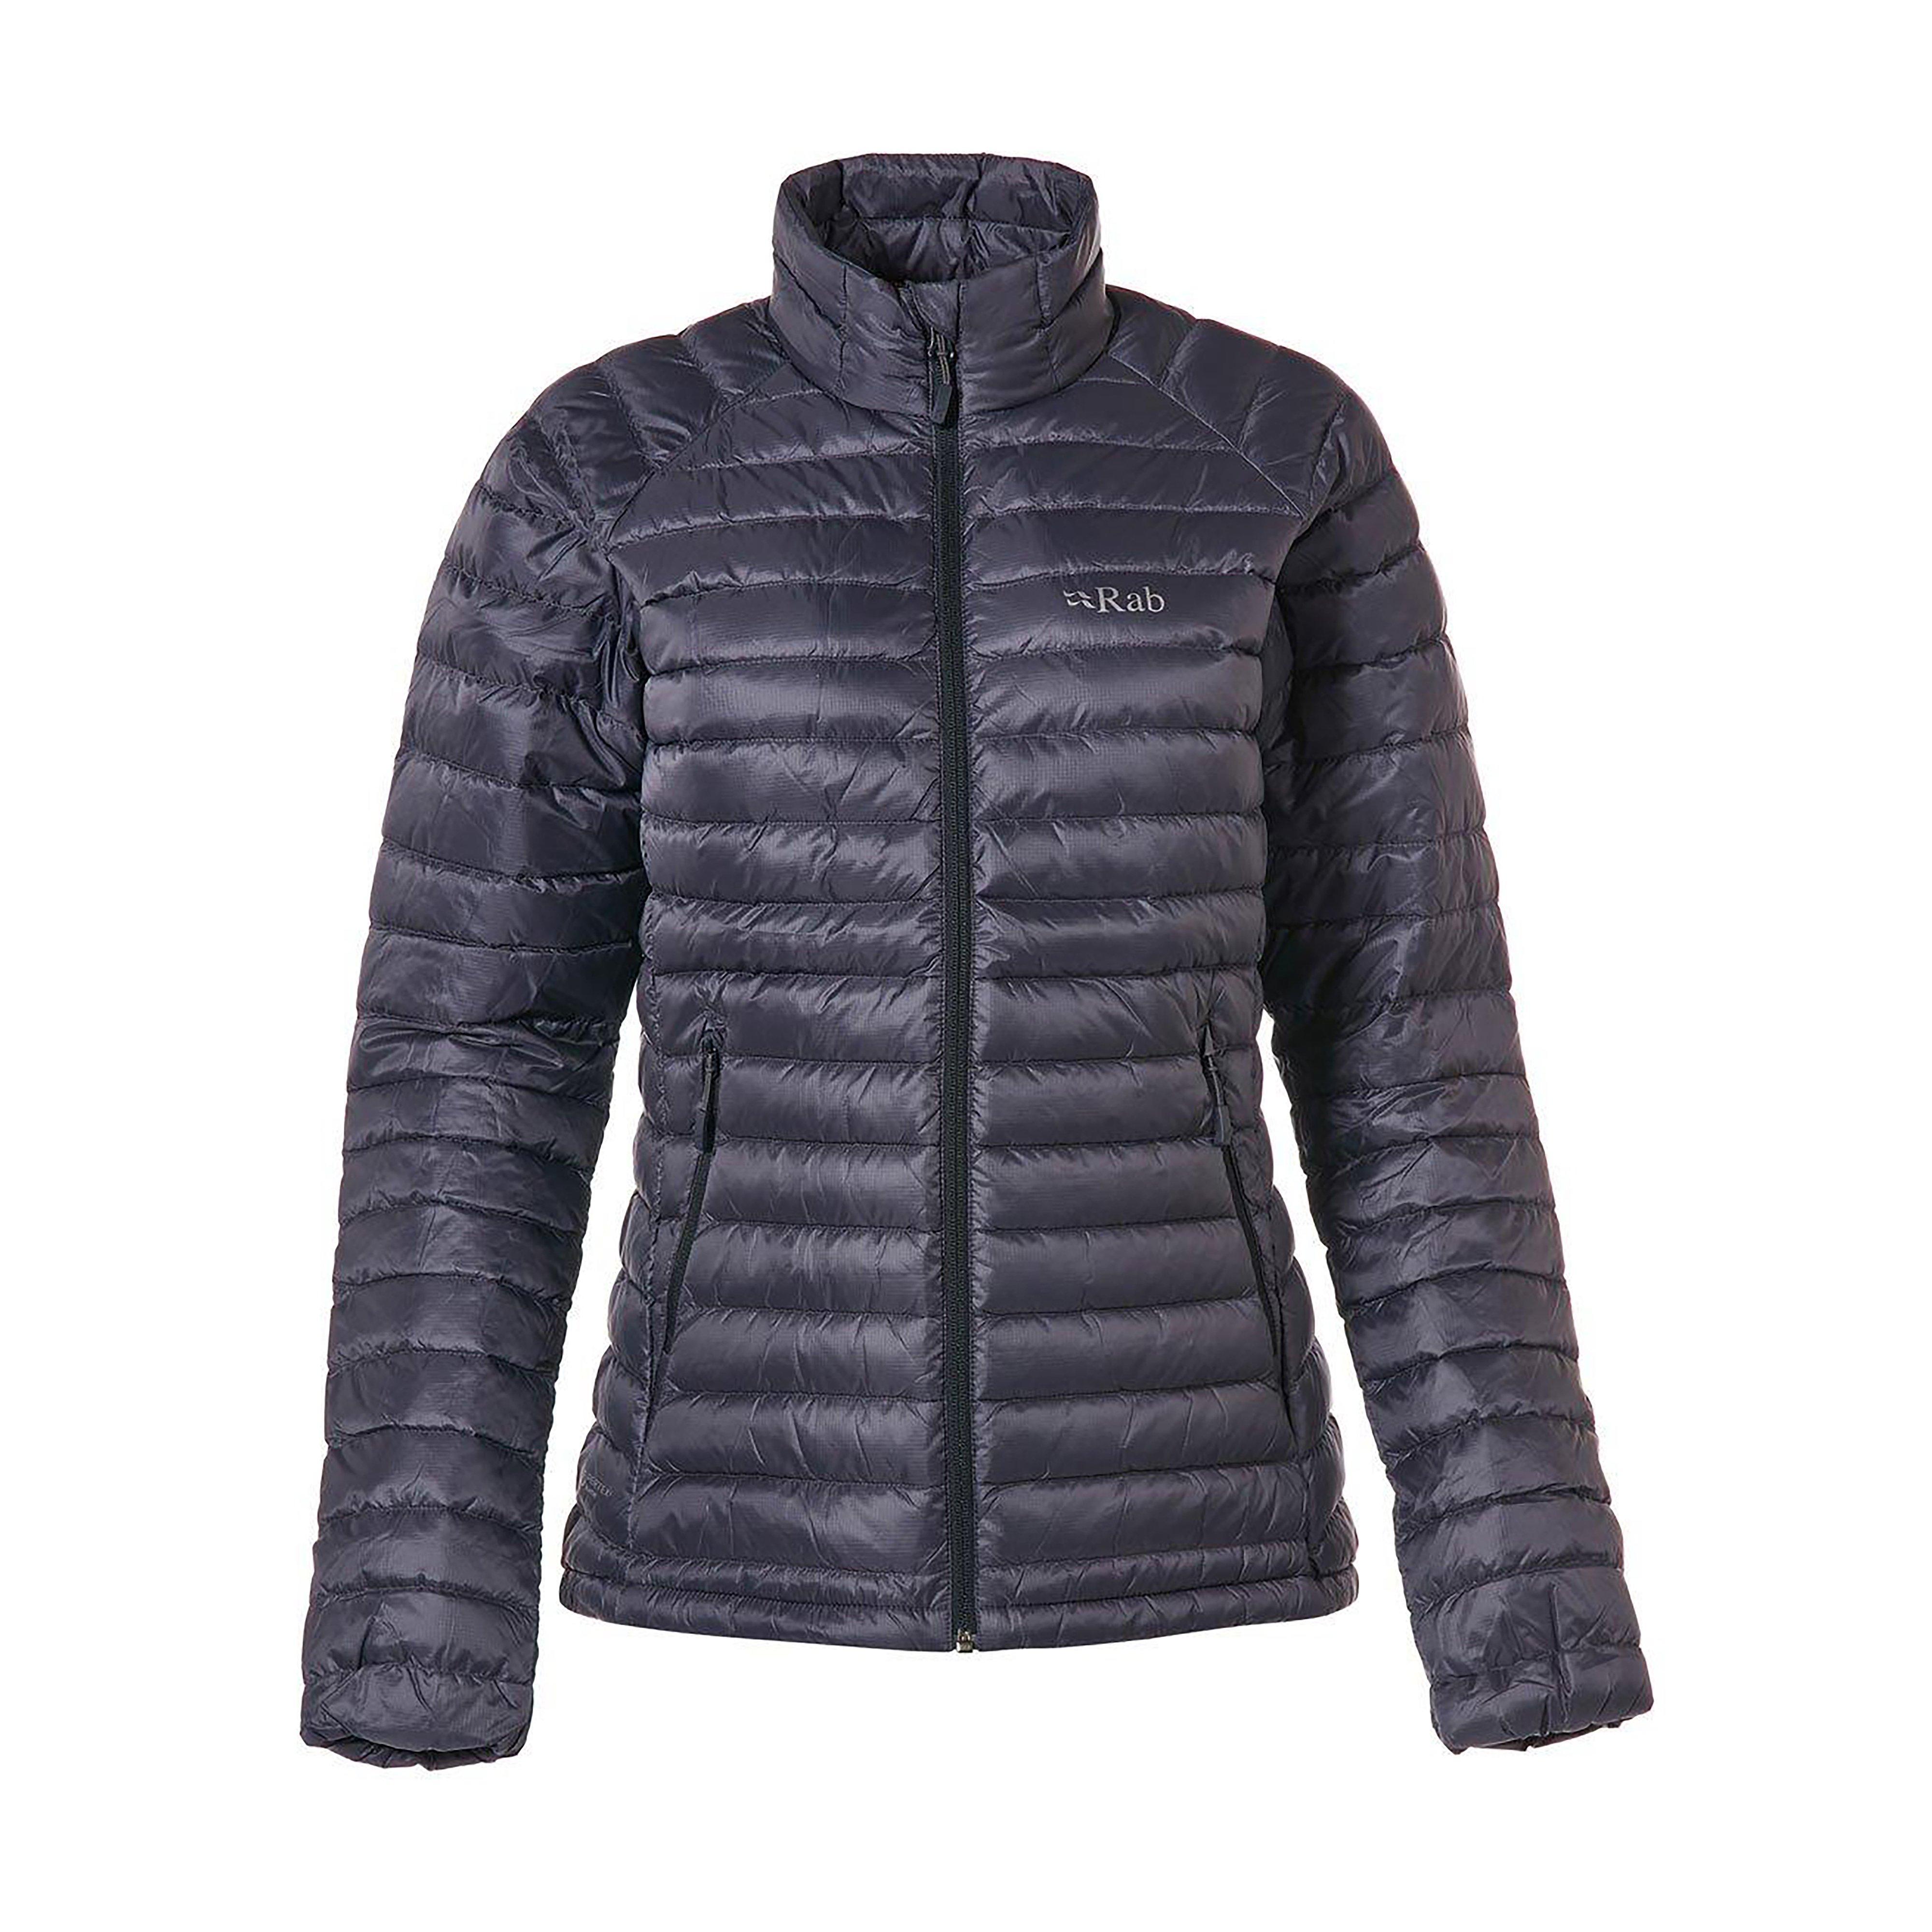 Rab Rab Womens Microlight Down Jacket - N/A, N/A